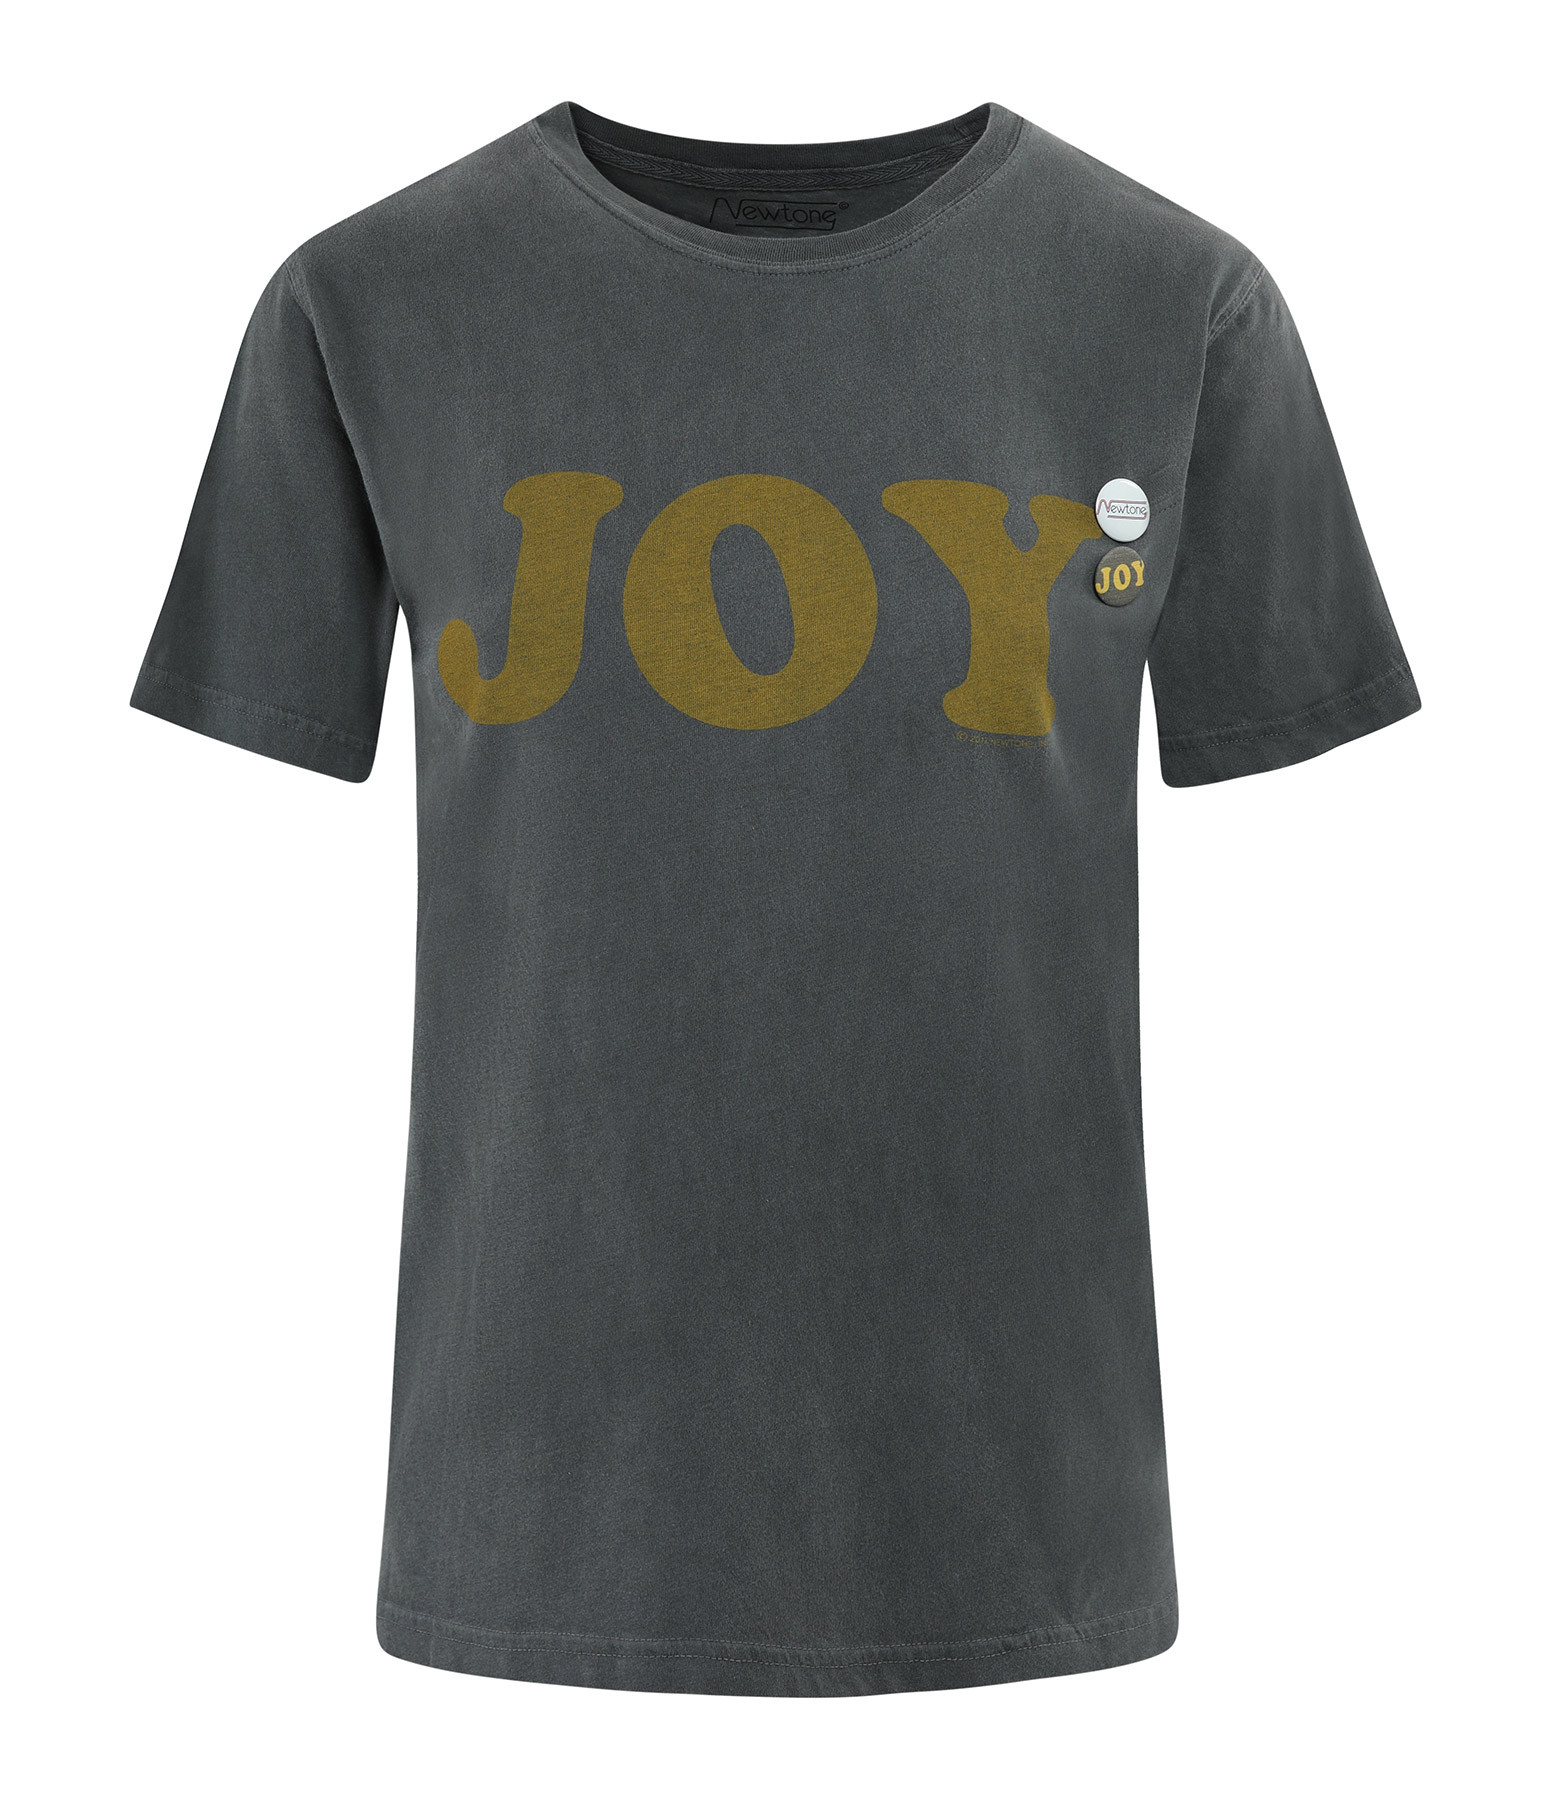 NEWTONE - Tee-shirt Joy Coton Pepper